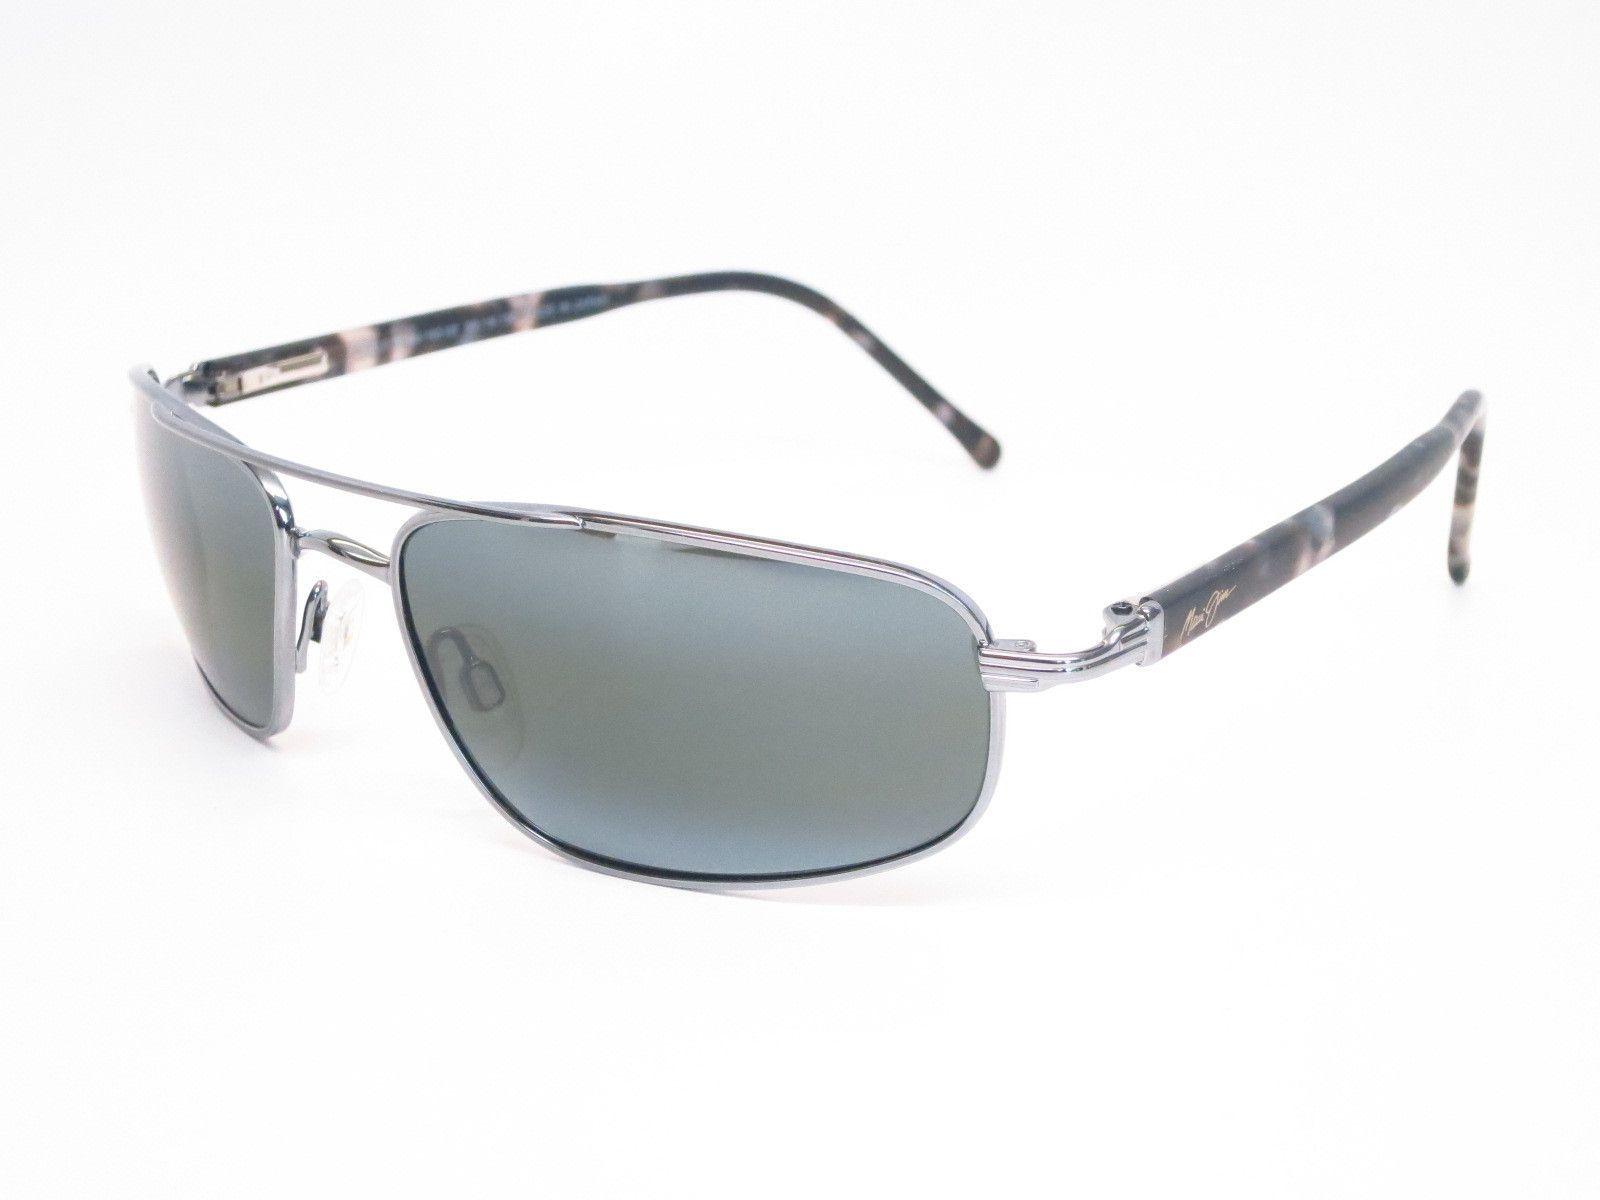 59f22b0fe59 Maui Jim Kahuna MJ 162-02 Gunmetal Polarized Sunglasses